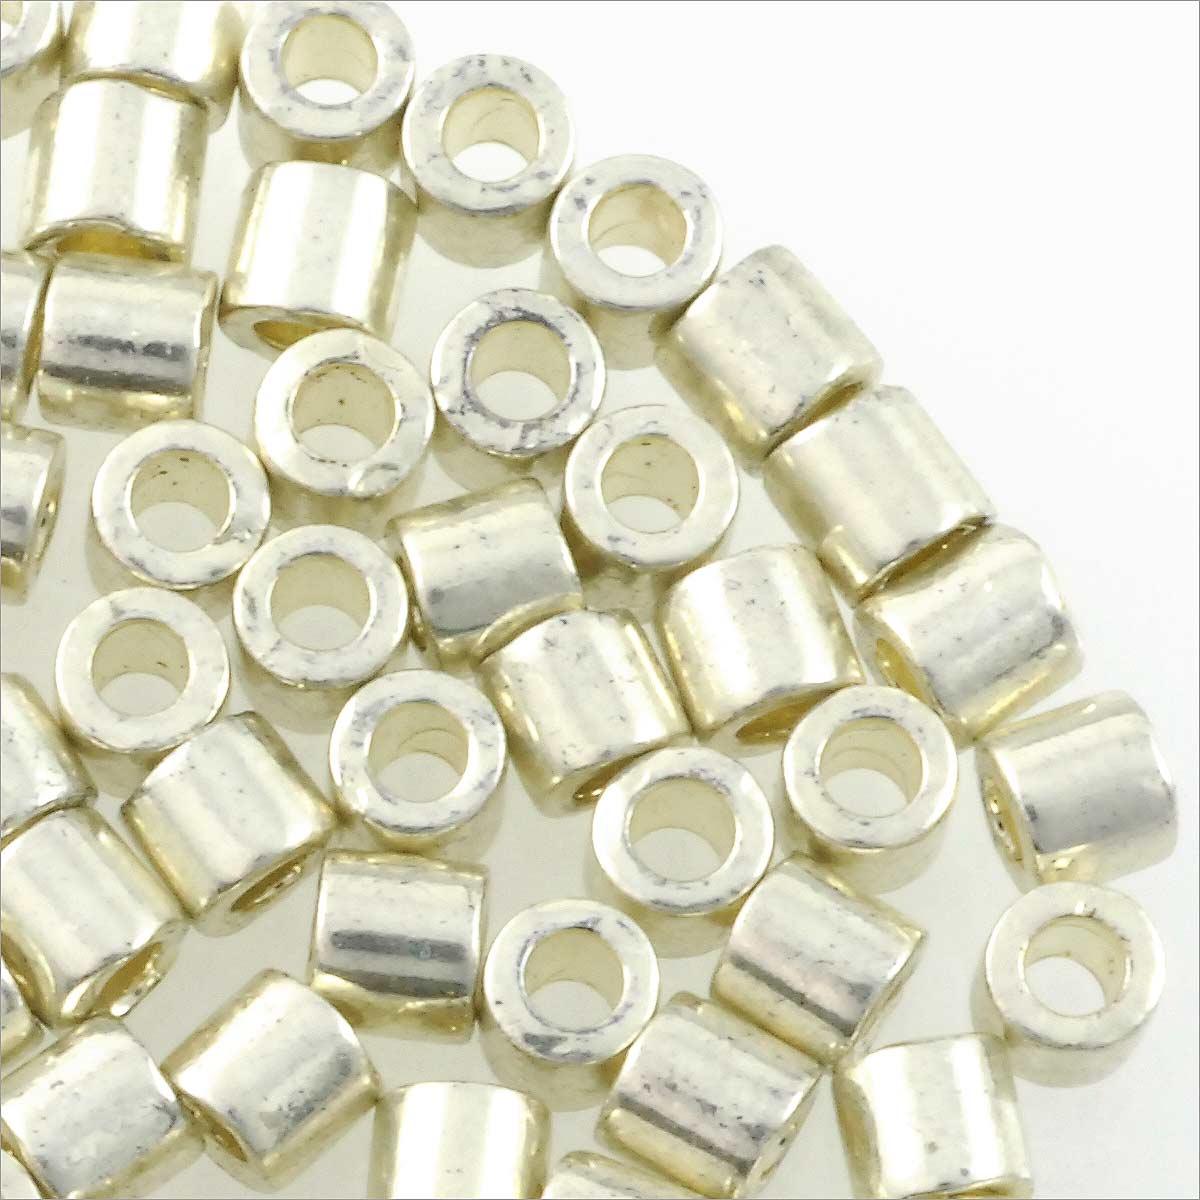 Where to buy silver - Miyuki Delica Seed Bead 8 0 Metallic Galvanized Silver 3 Gram Tube